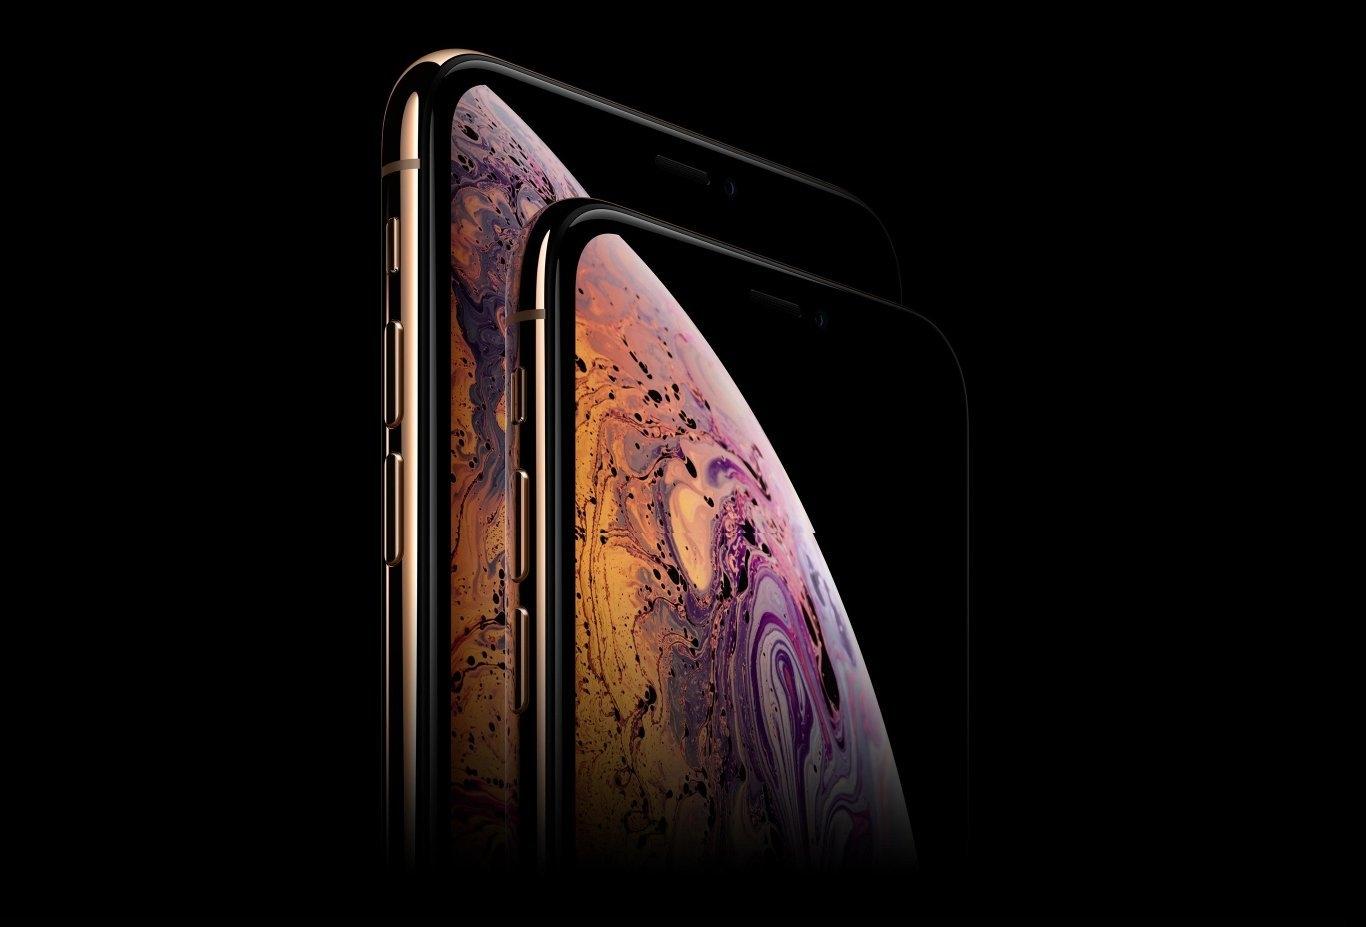 iphone xs max 256gb Apple IPhone XS Max 256GB – Dual SIM (nano-SIM) bb4b492cea7d6e3a72e1573c79c74570